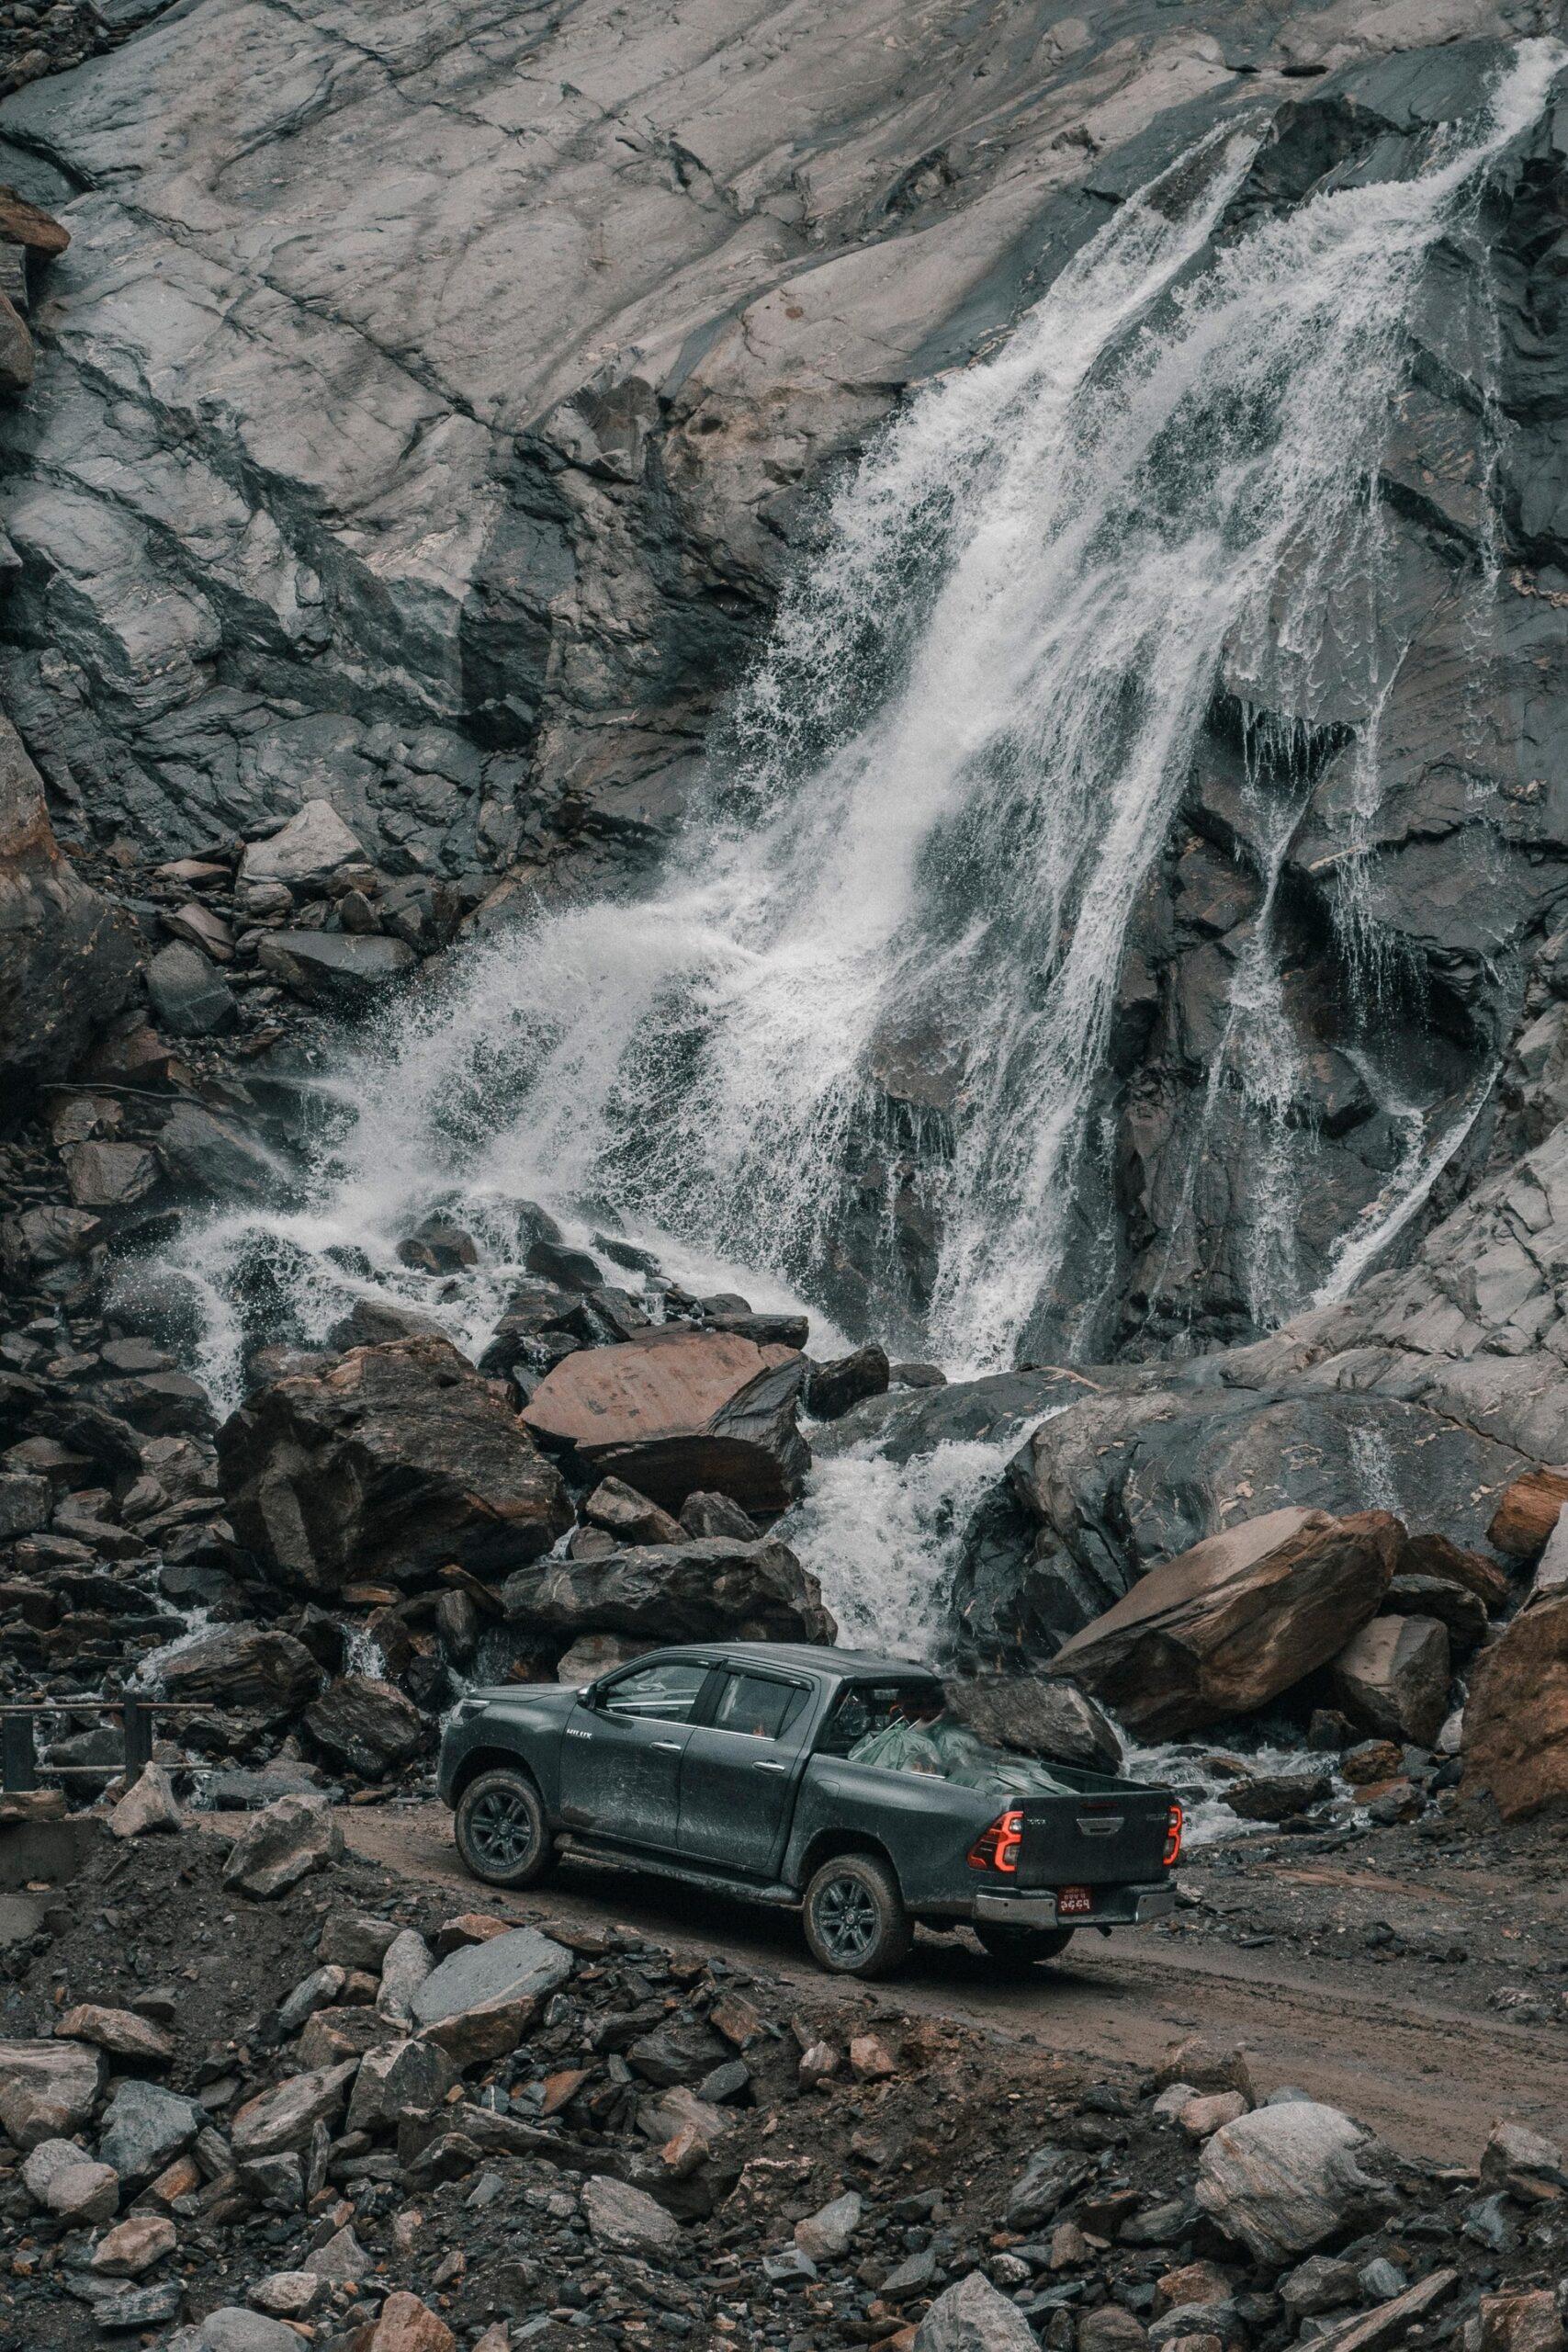 Toyota Hilux, Rupse Waterfall, Mustang, Journey to Mustang during Lockdown, Nepal8thwonder